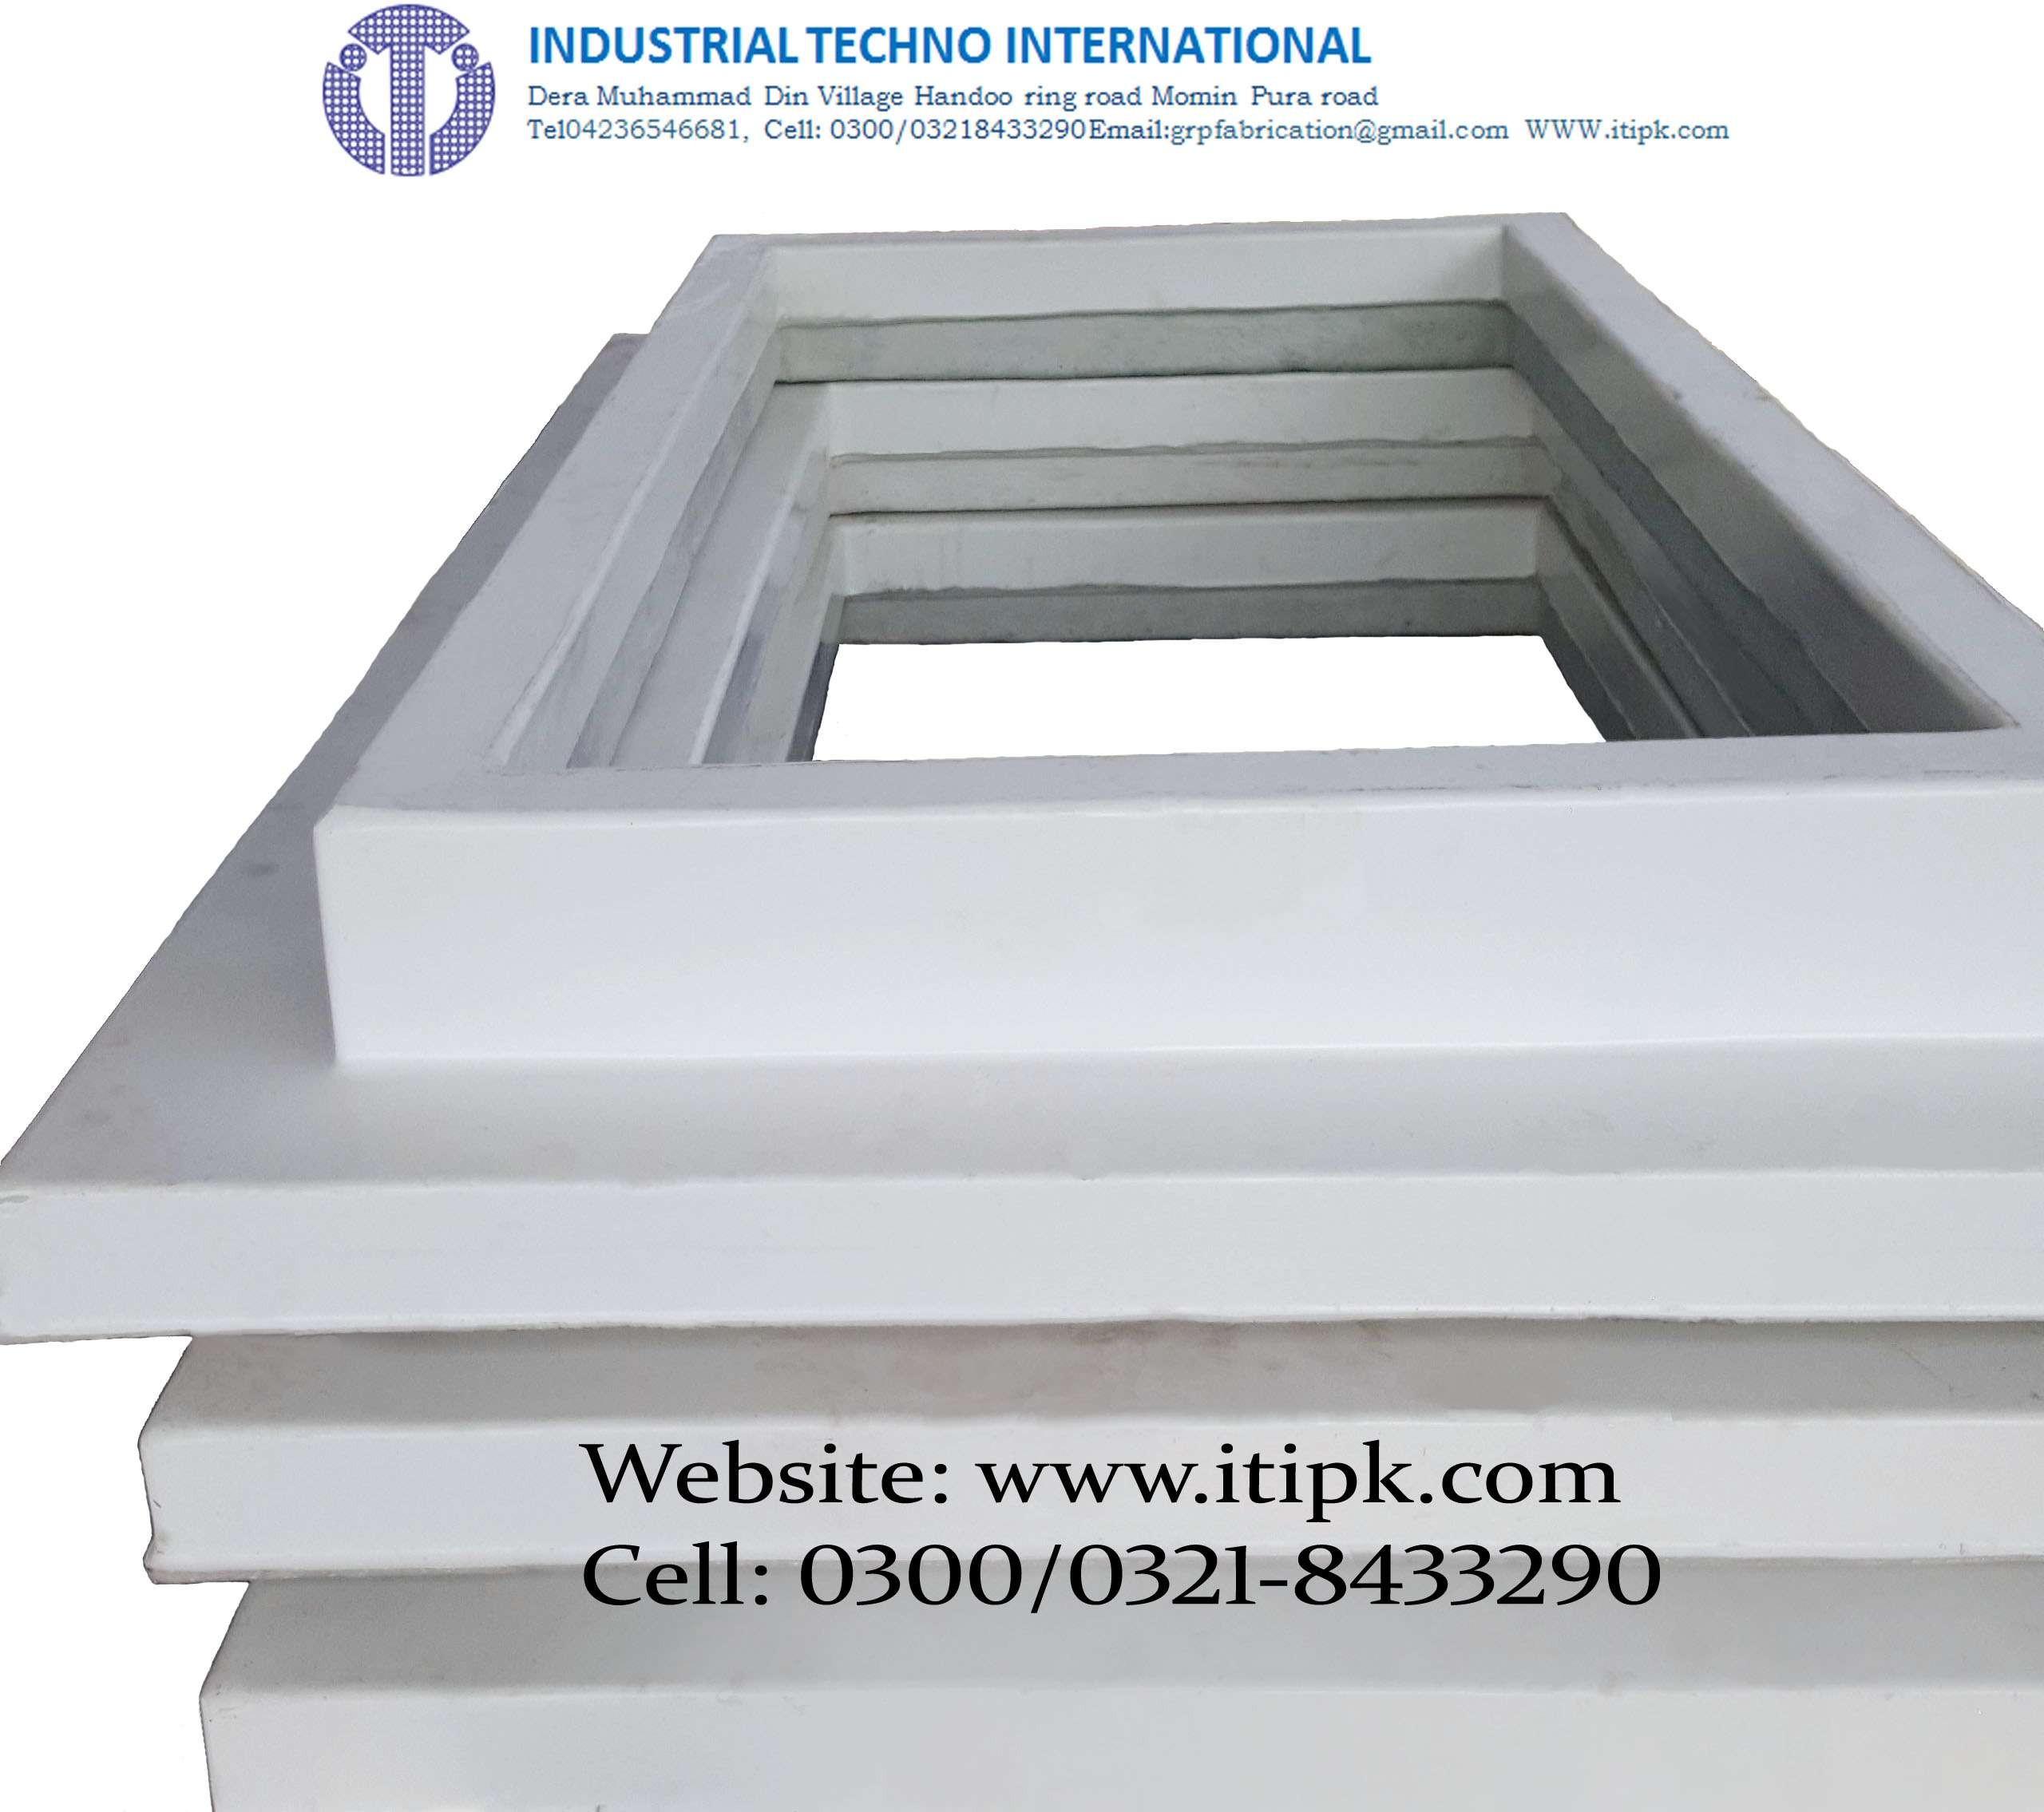 Fiberglass Concrete shed Roofing Curb Size 4' x 2'